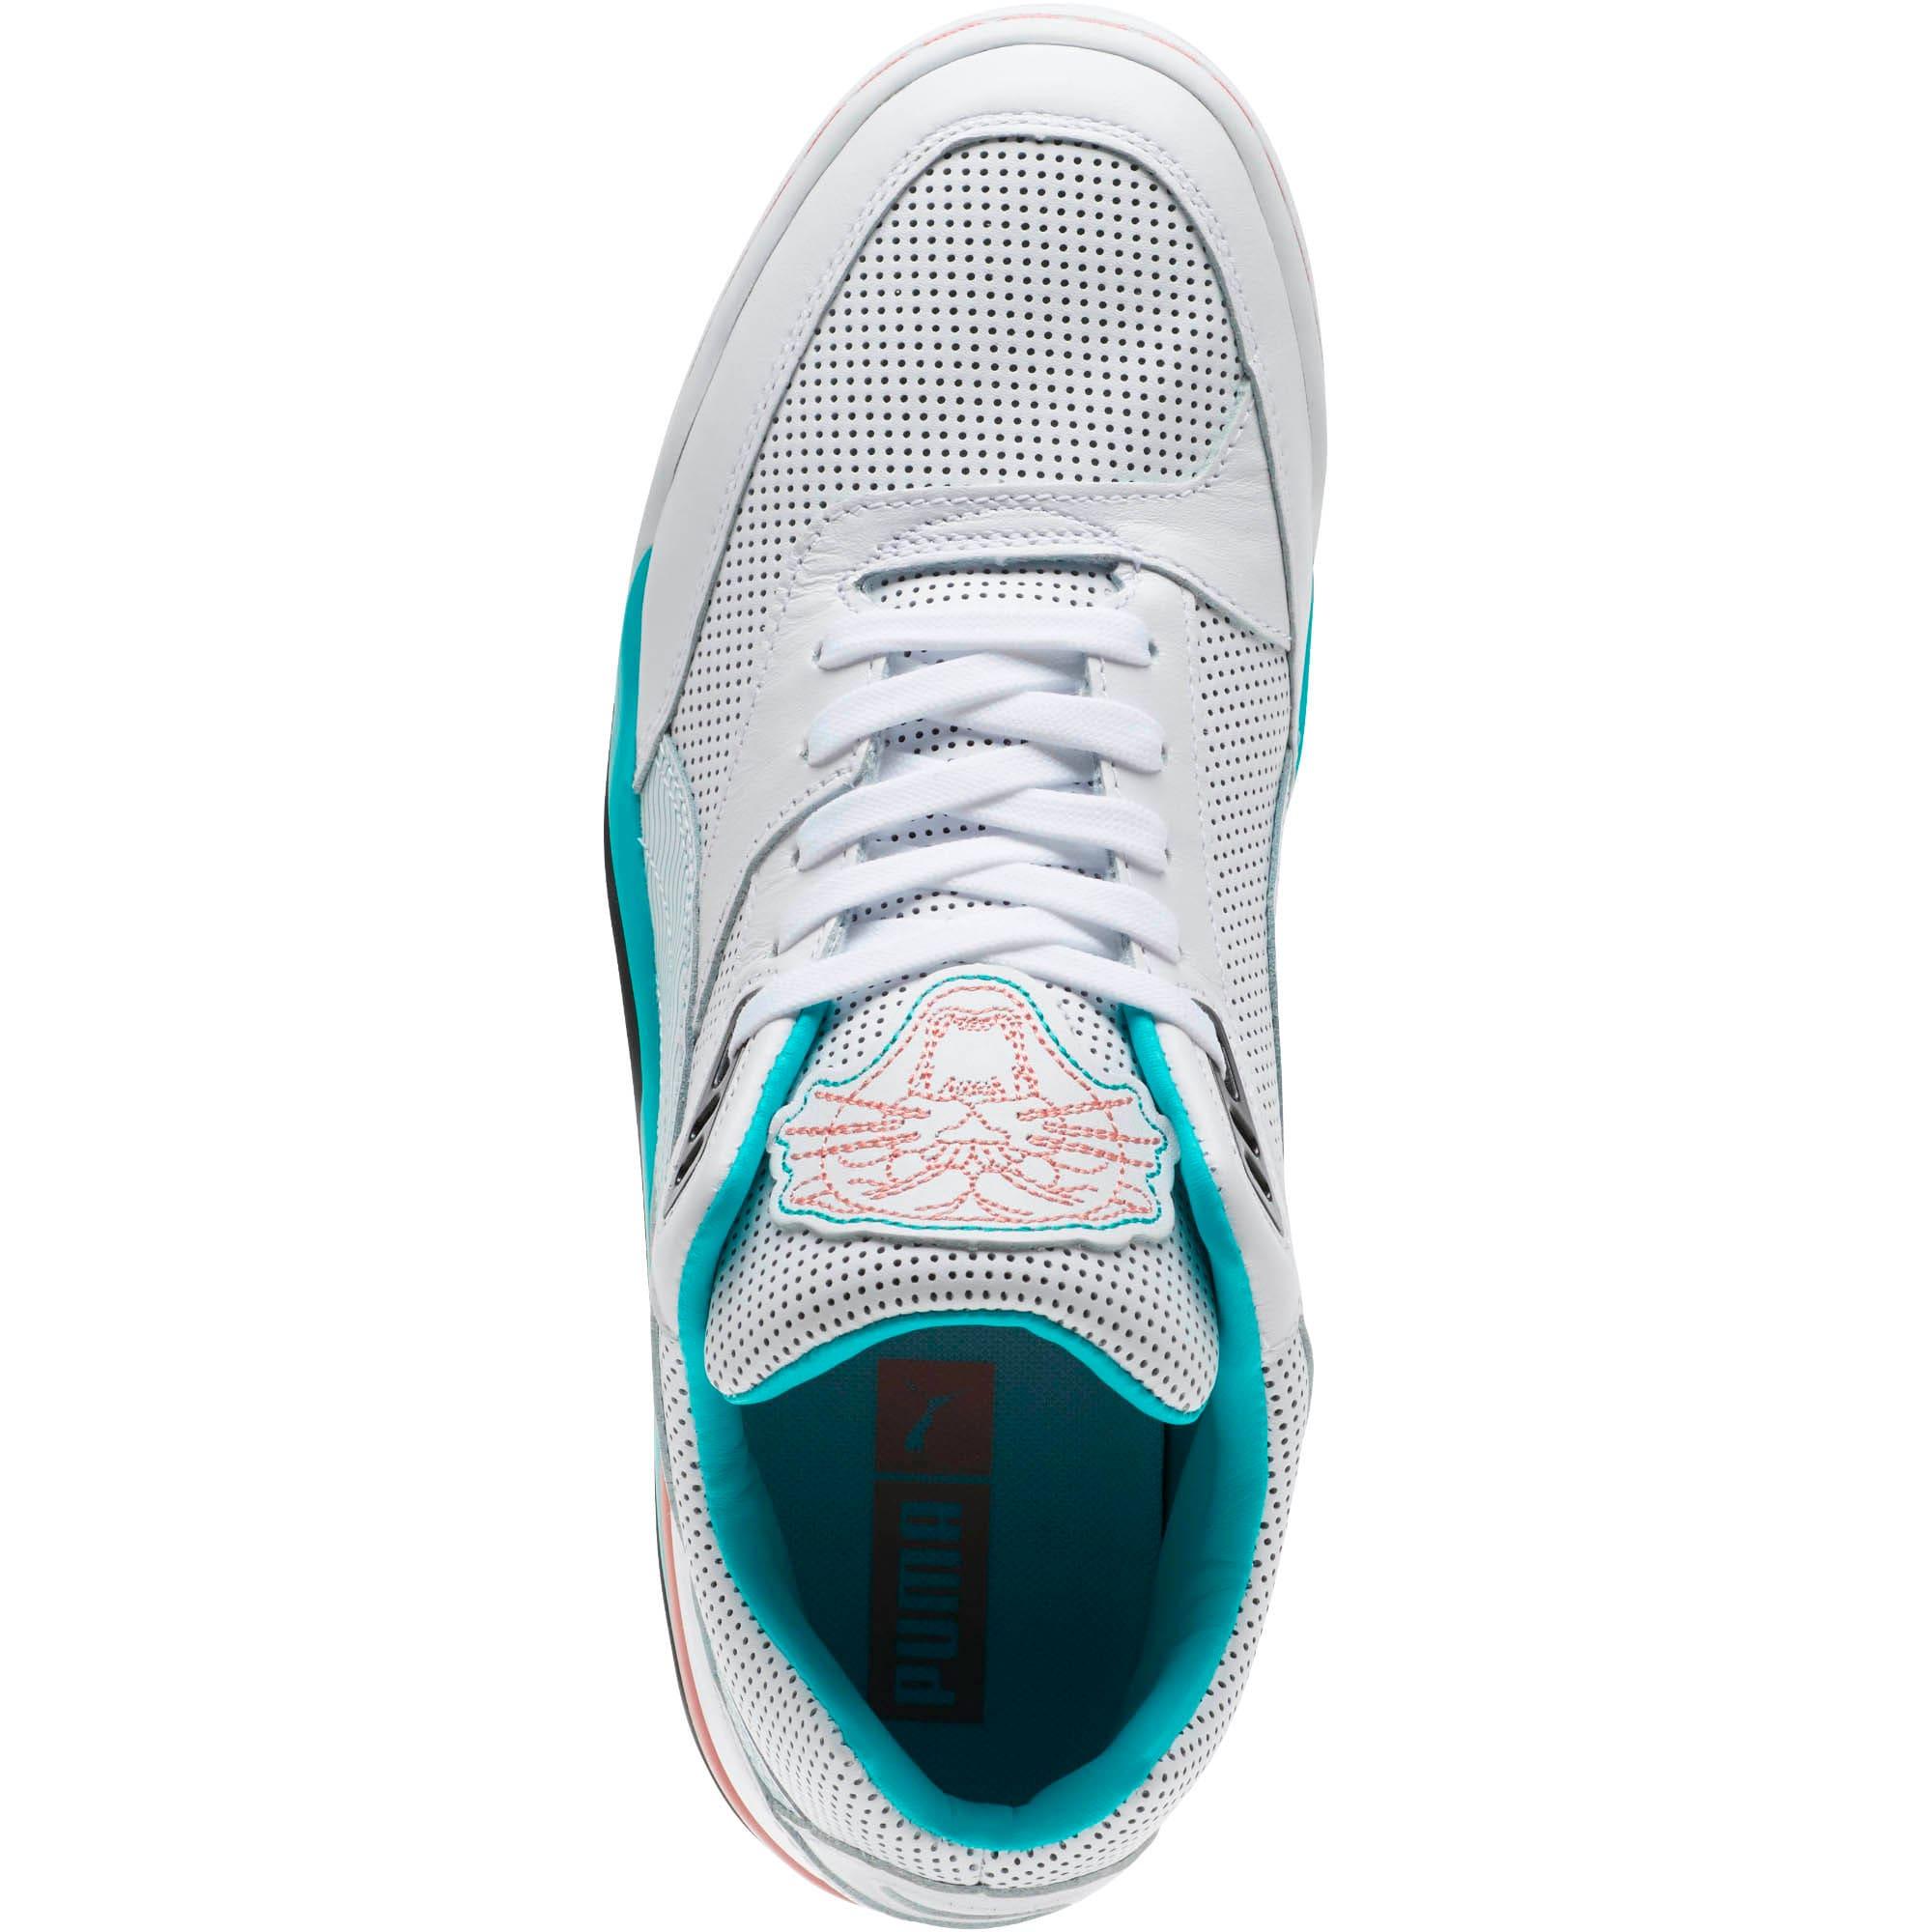 Thumbnail 5 of Palace Guard Last Dayz Men's Sneakers, Puma White-Geranium, medium